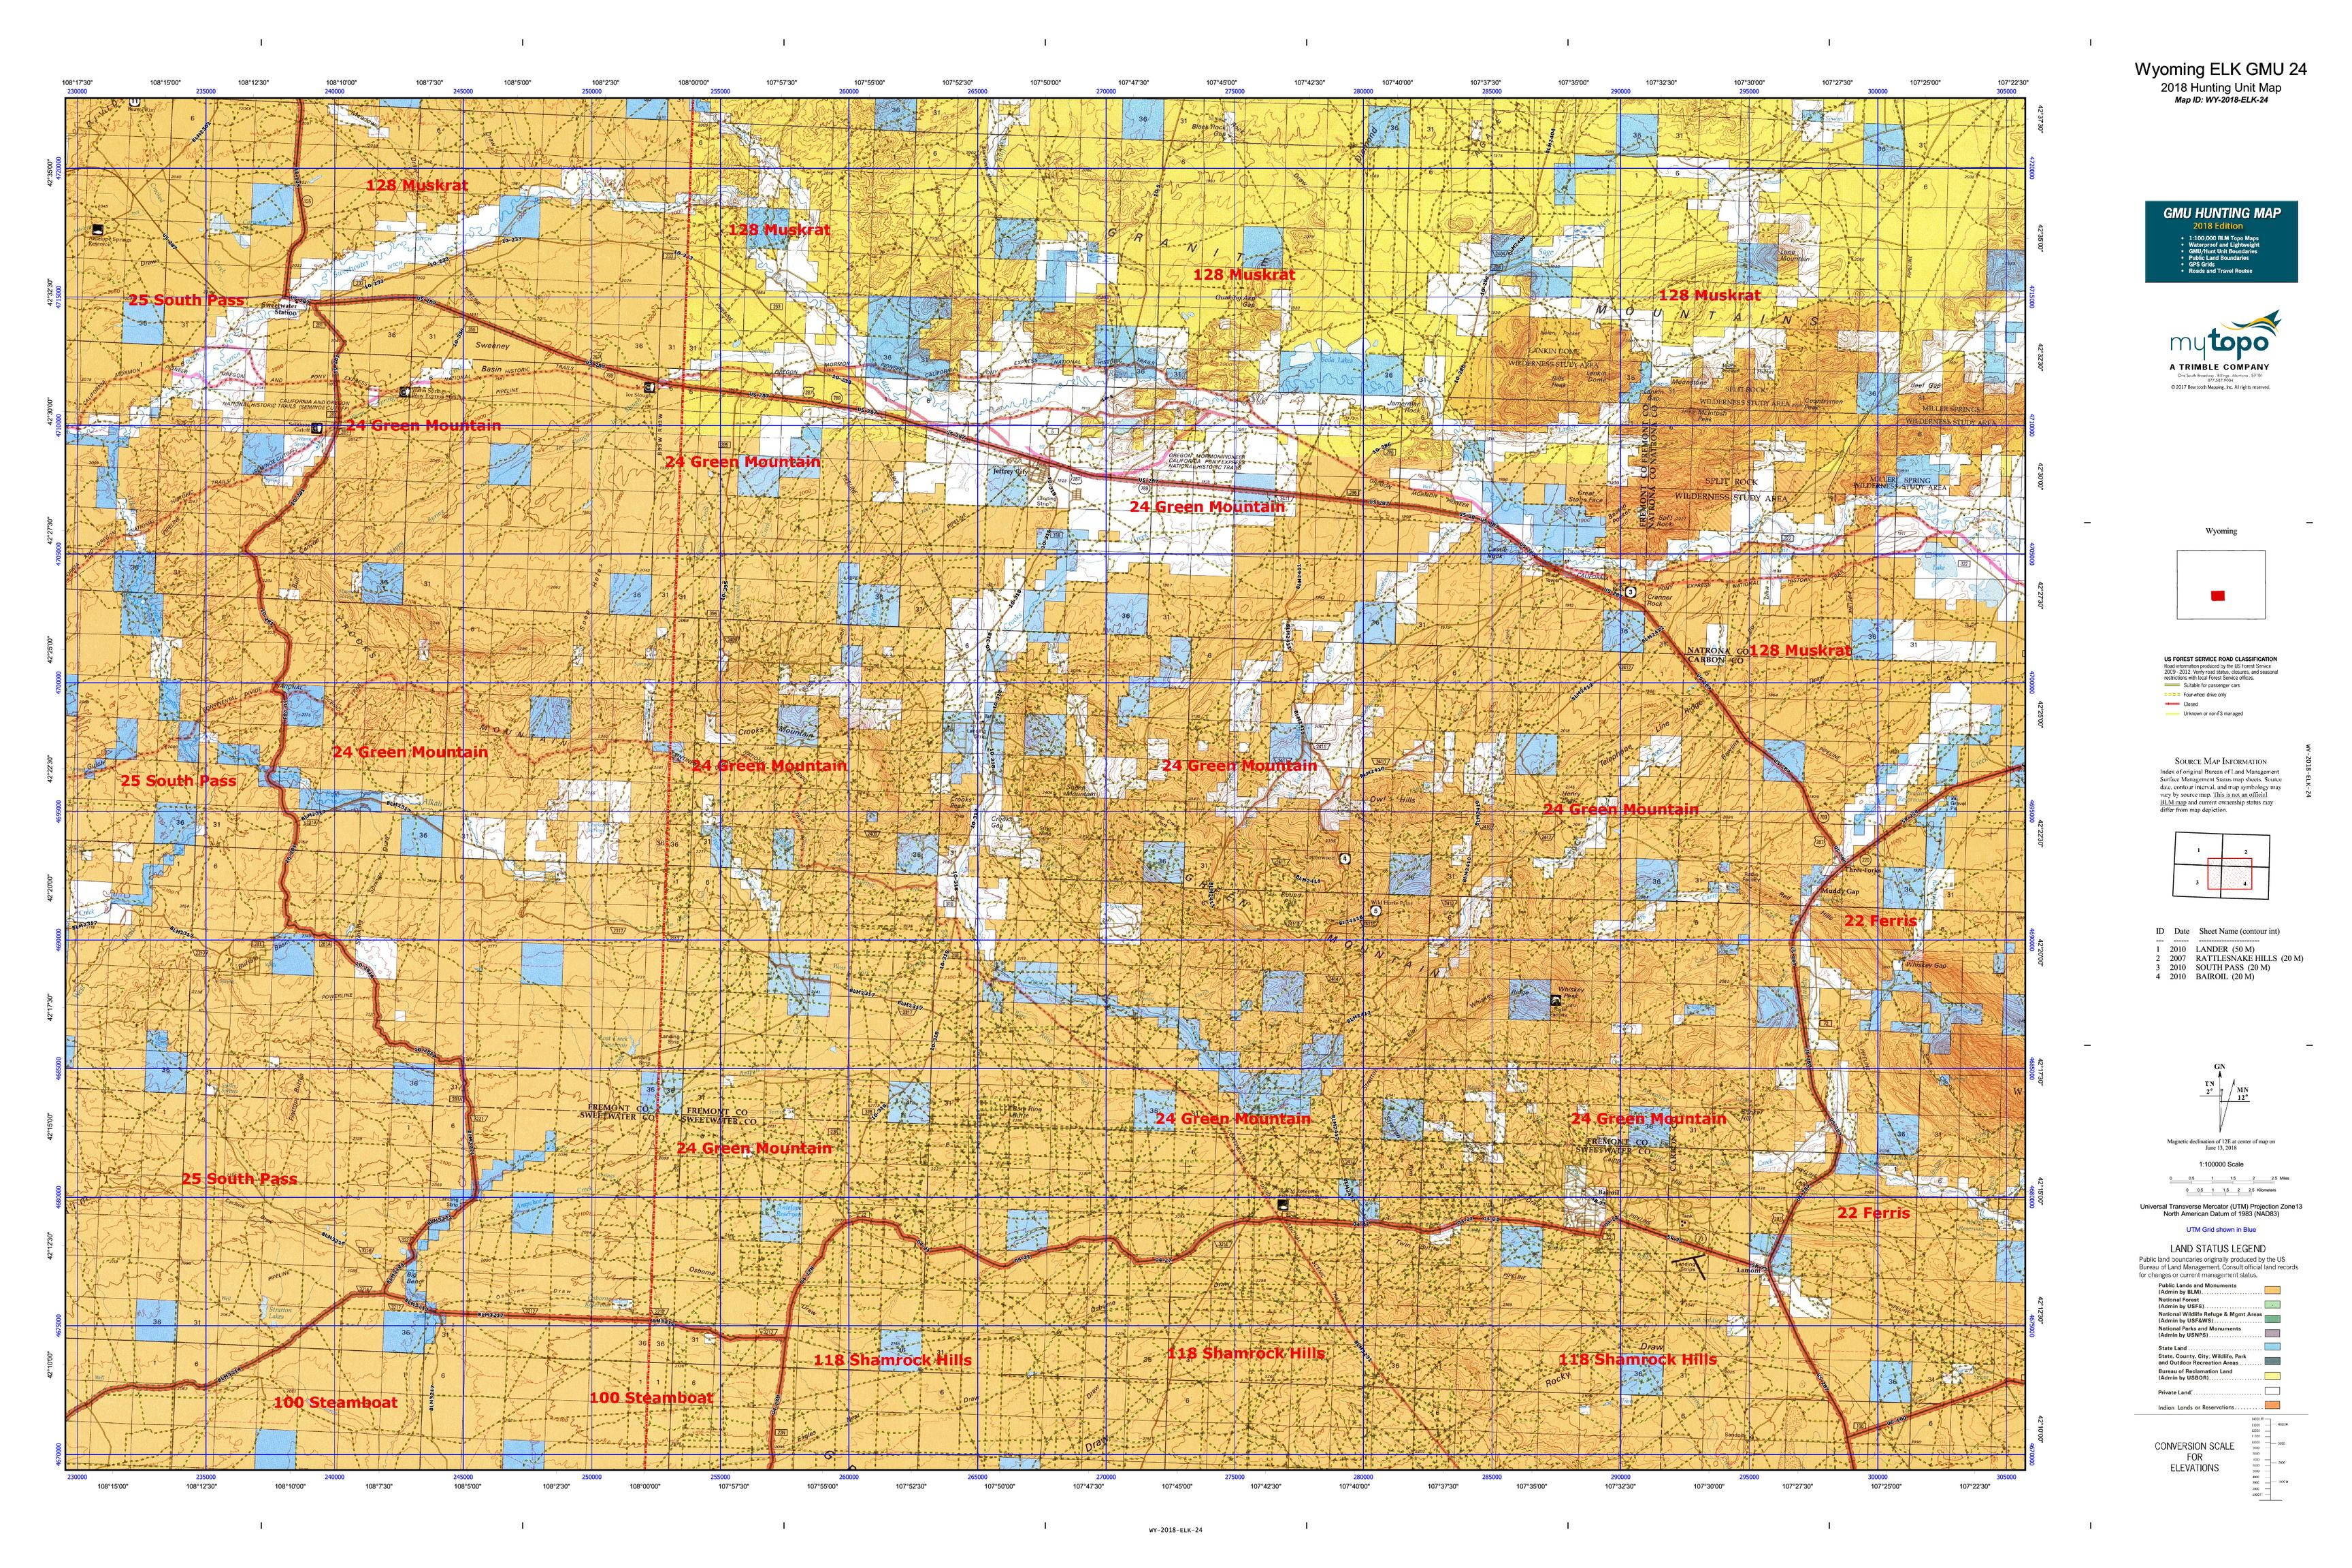 Wyoming ELK GMU 24 Map | MyTopo